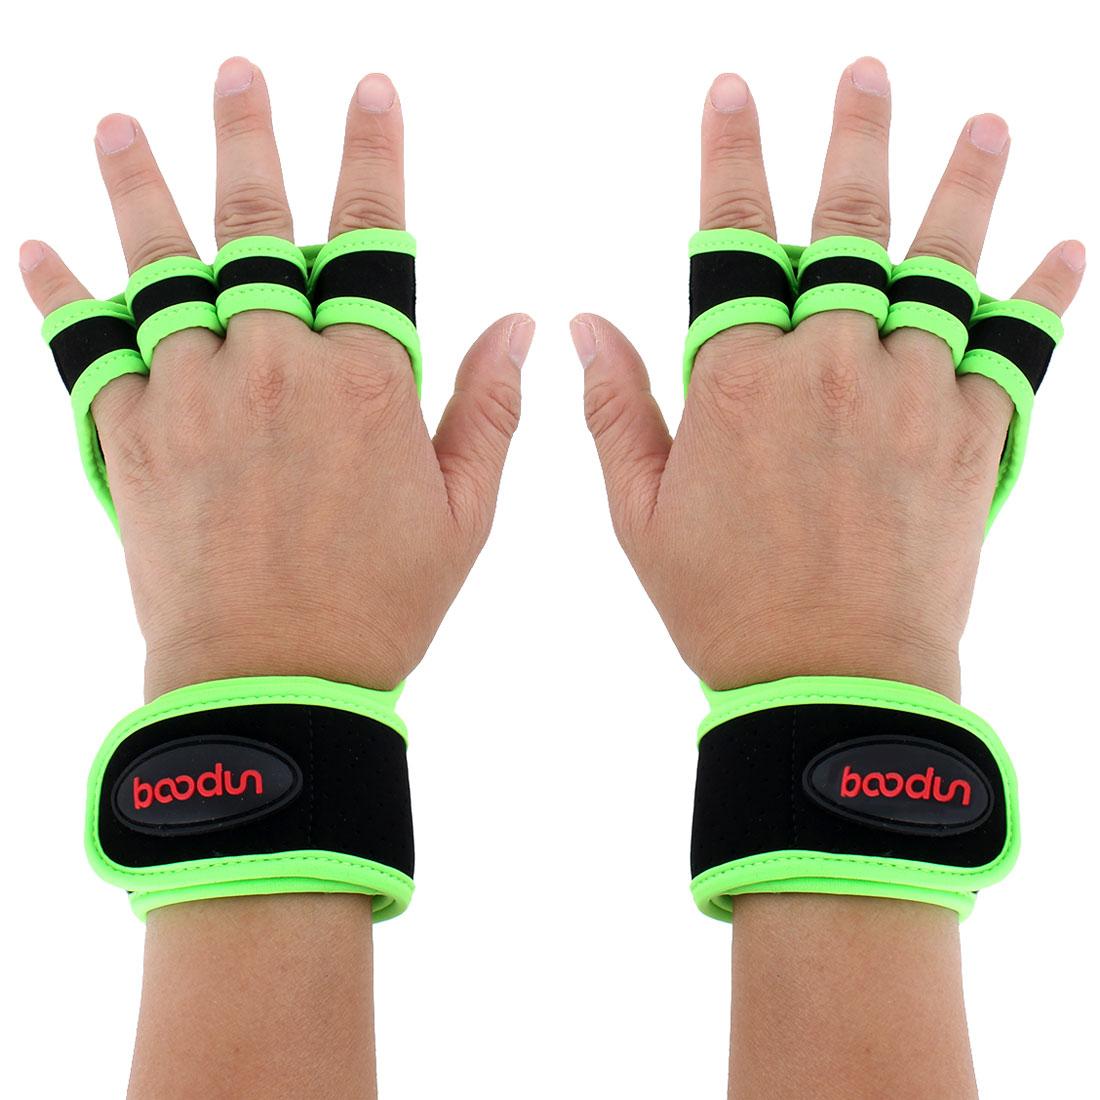 BOODUN Authorized Indoor Workout Training Sports Adjustable Anti Slip Fitness Gloves Green M Size Pair